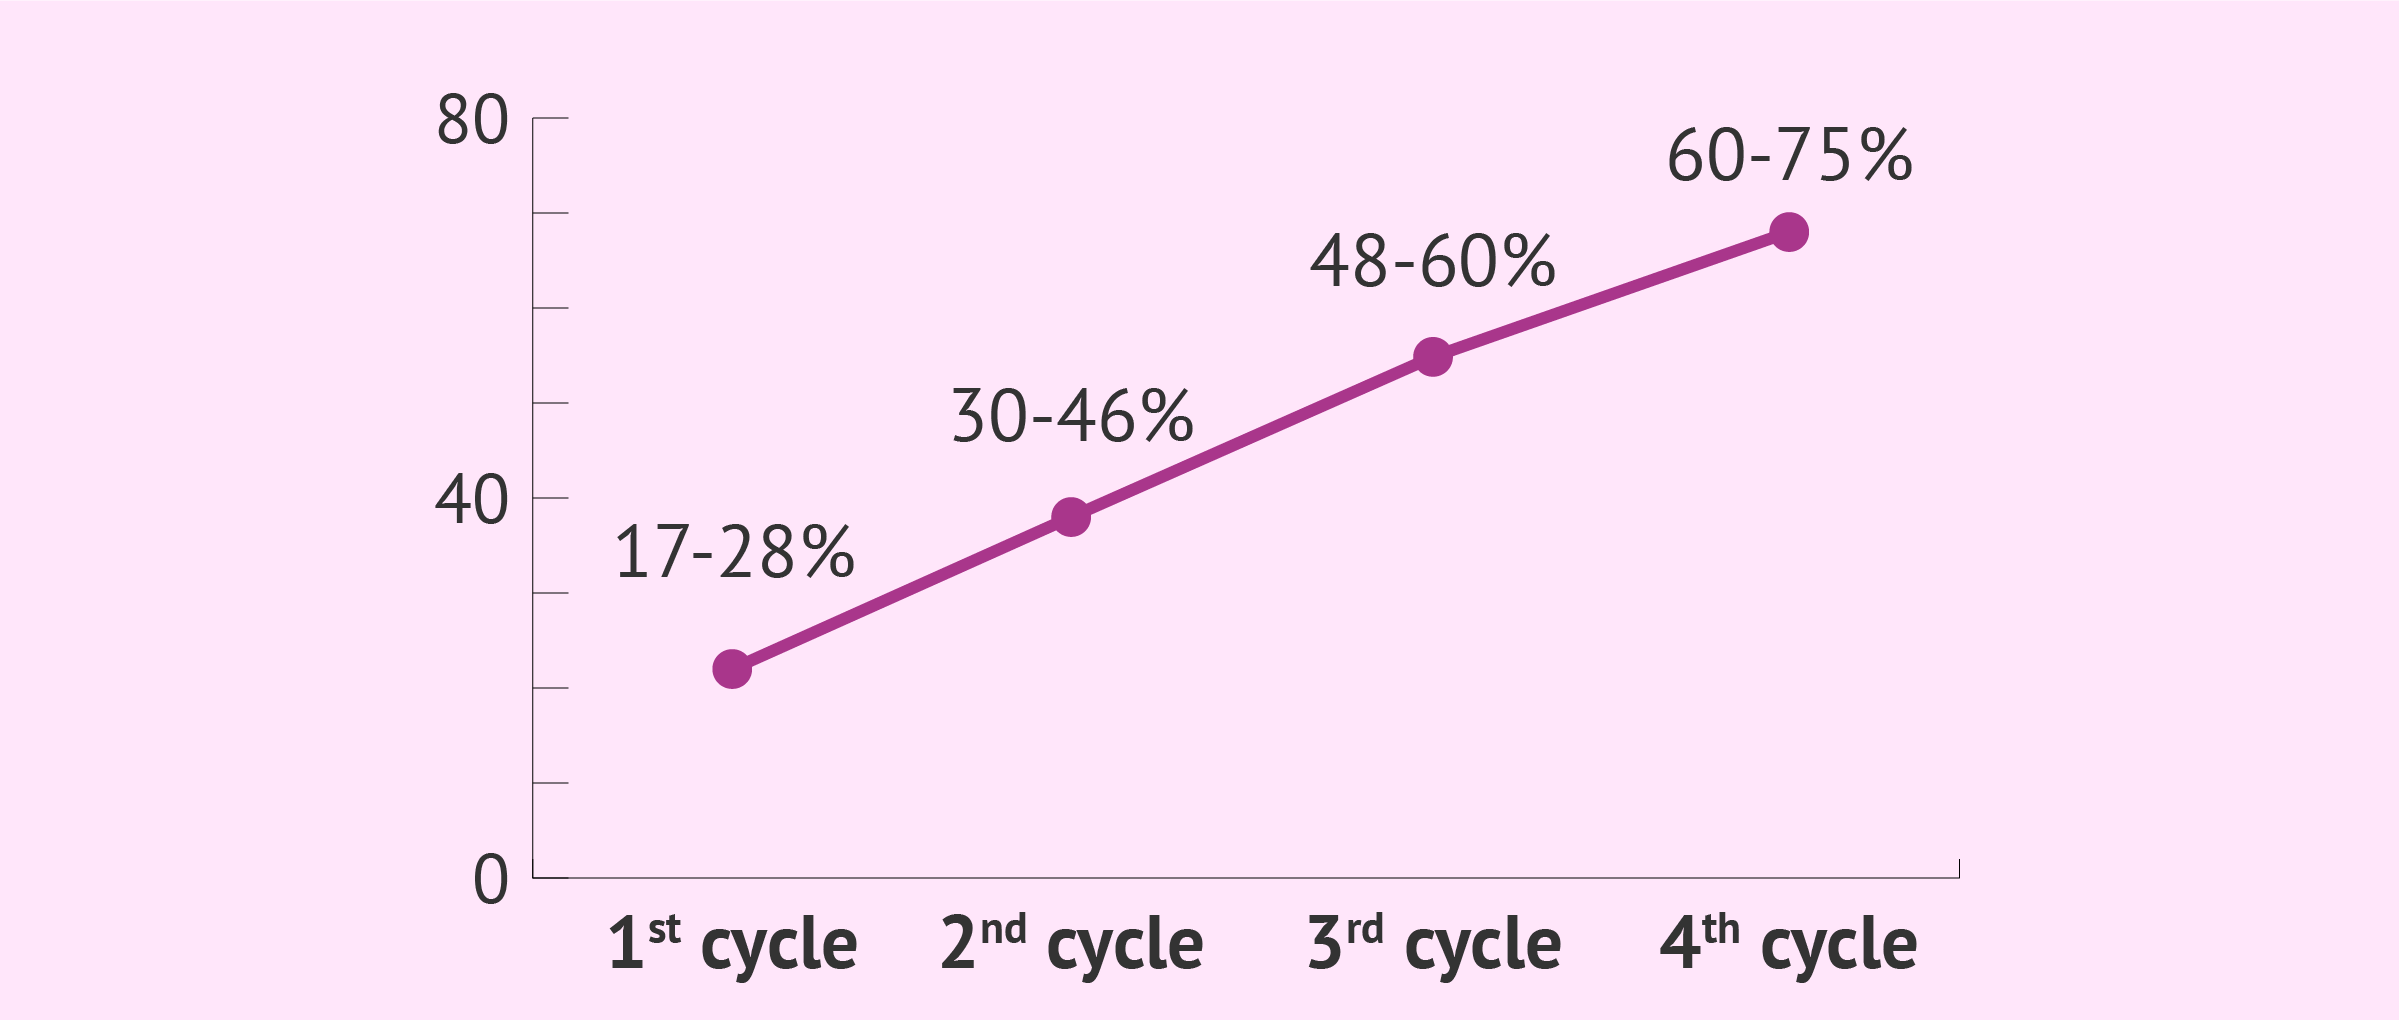 Chances of pregnancy after four AID attempts